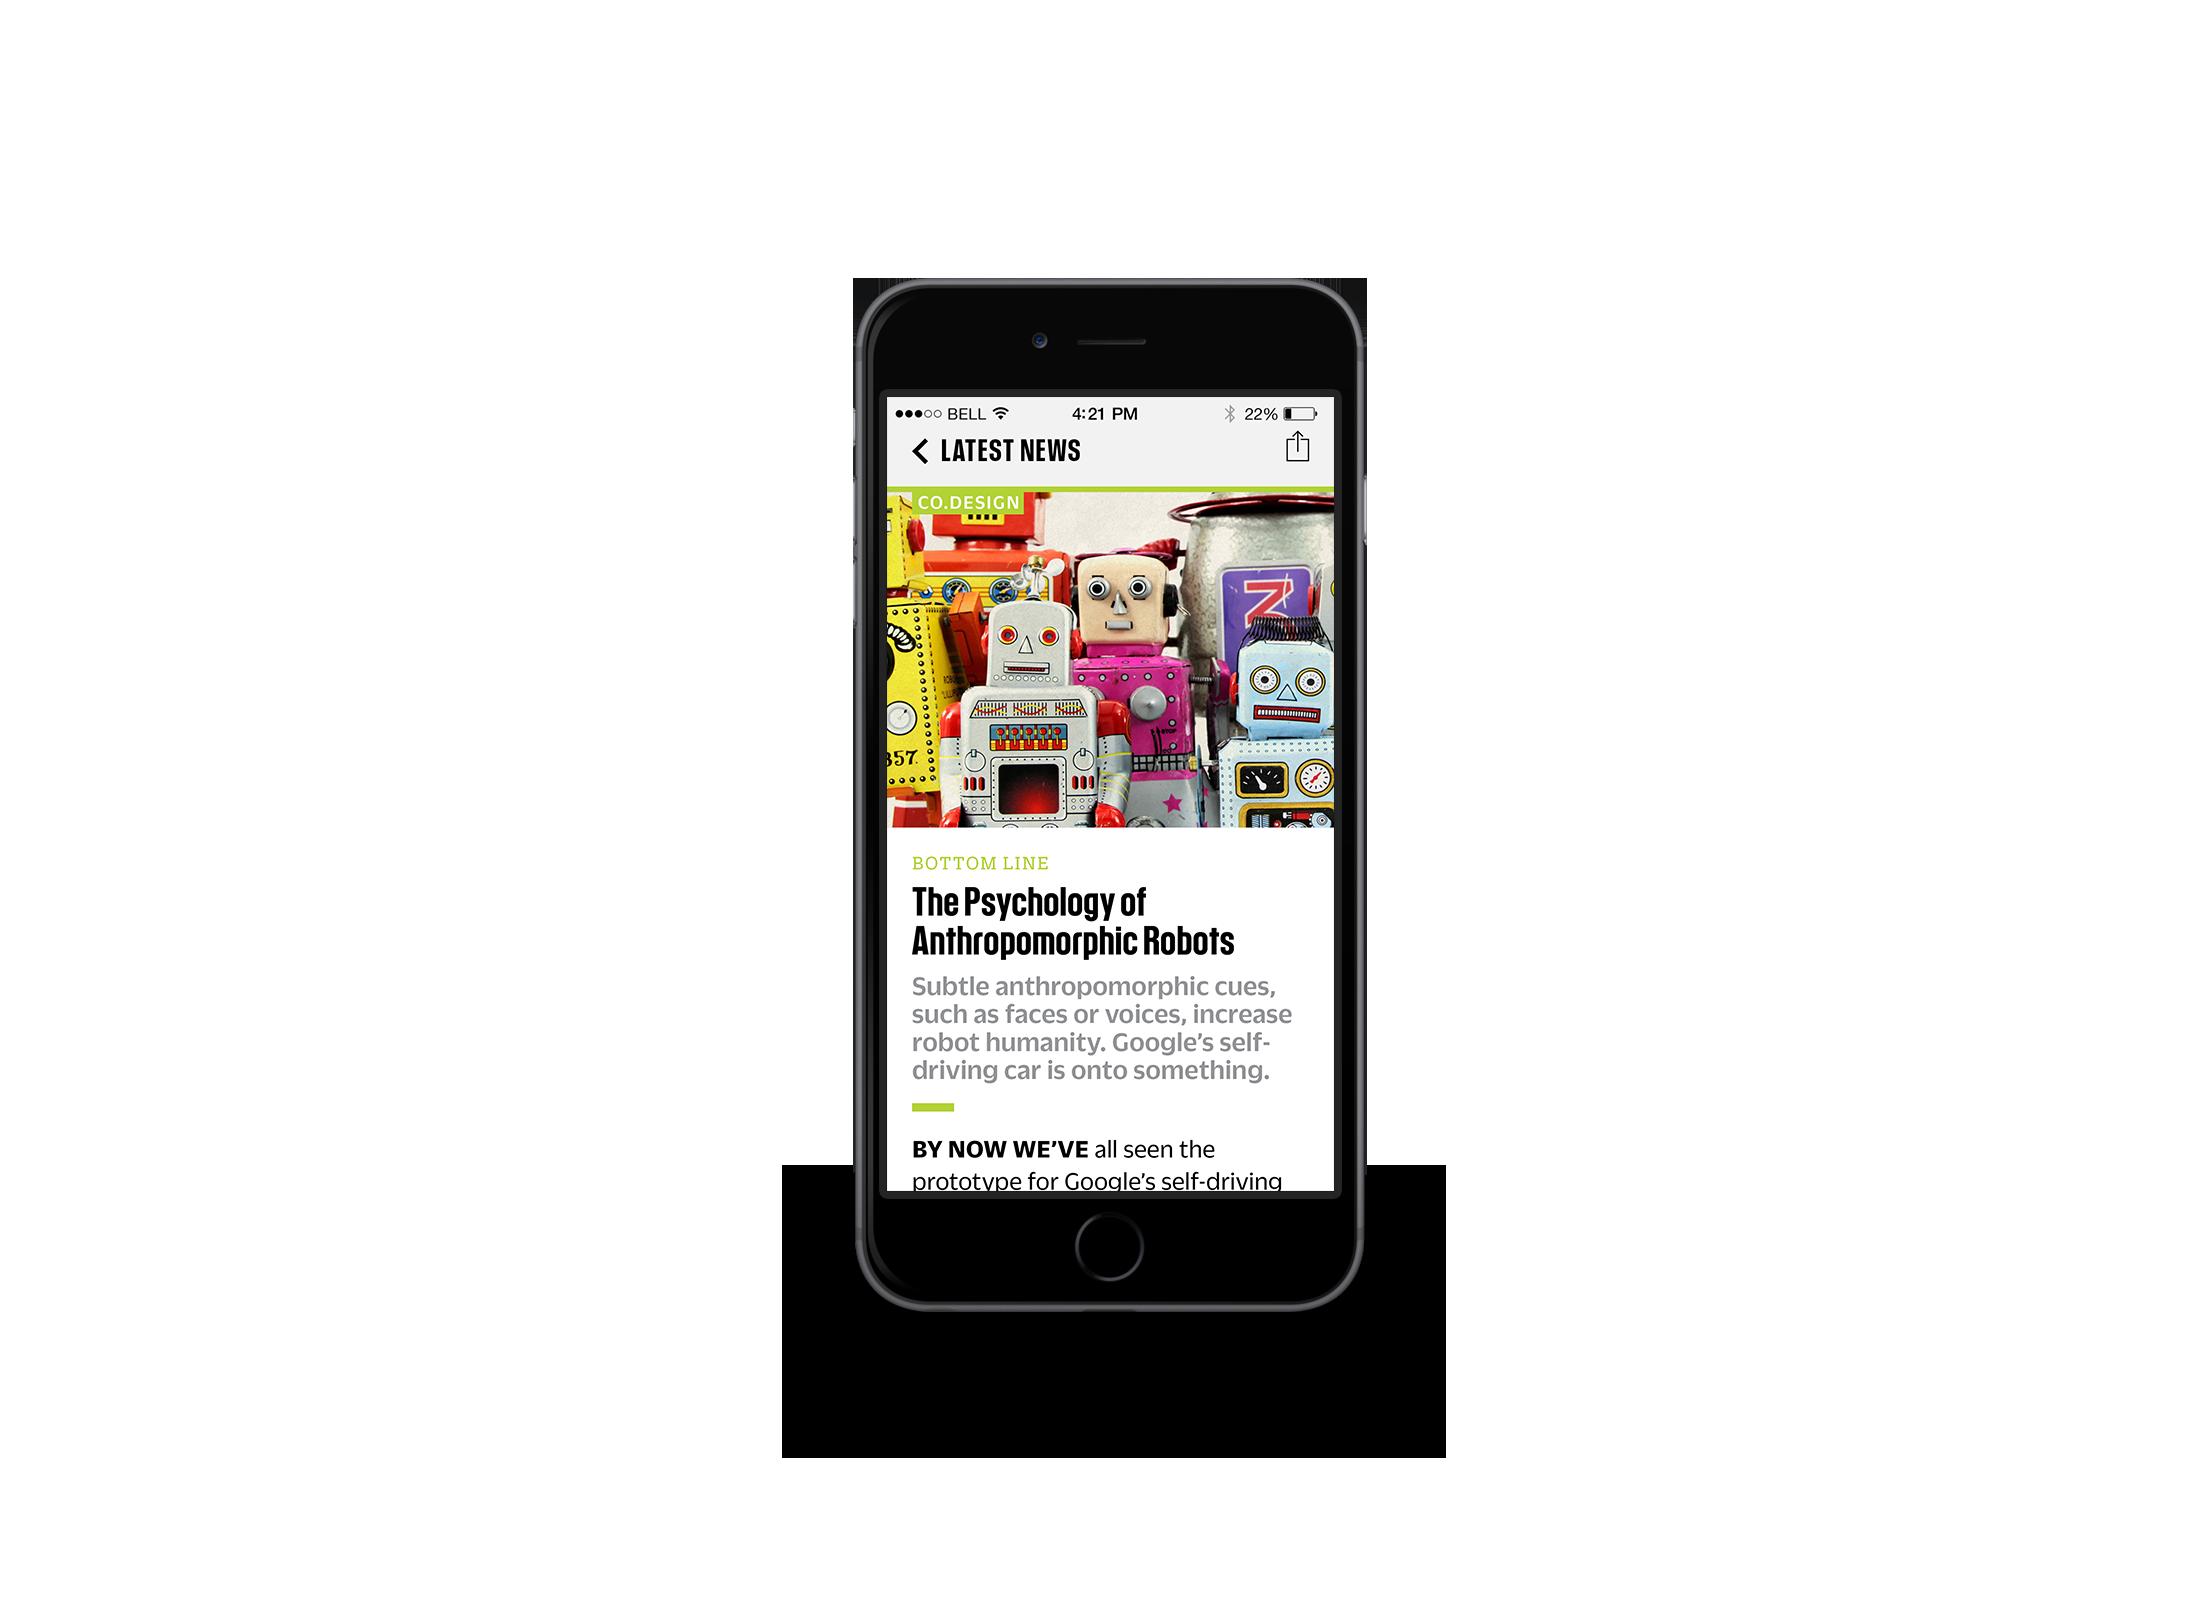 FastCompany_Phone_04_FeedArticle.01.png